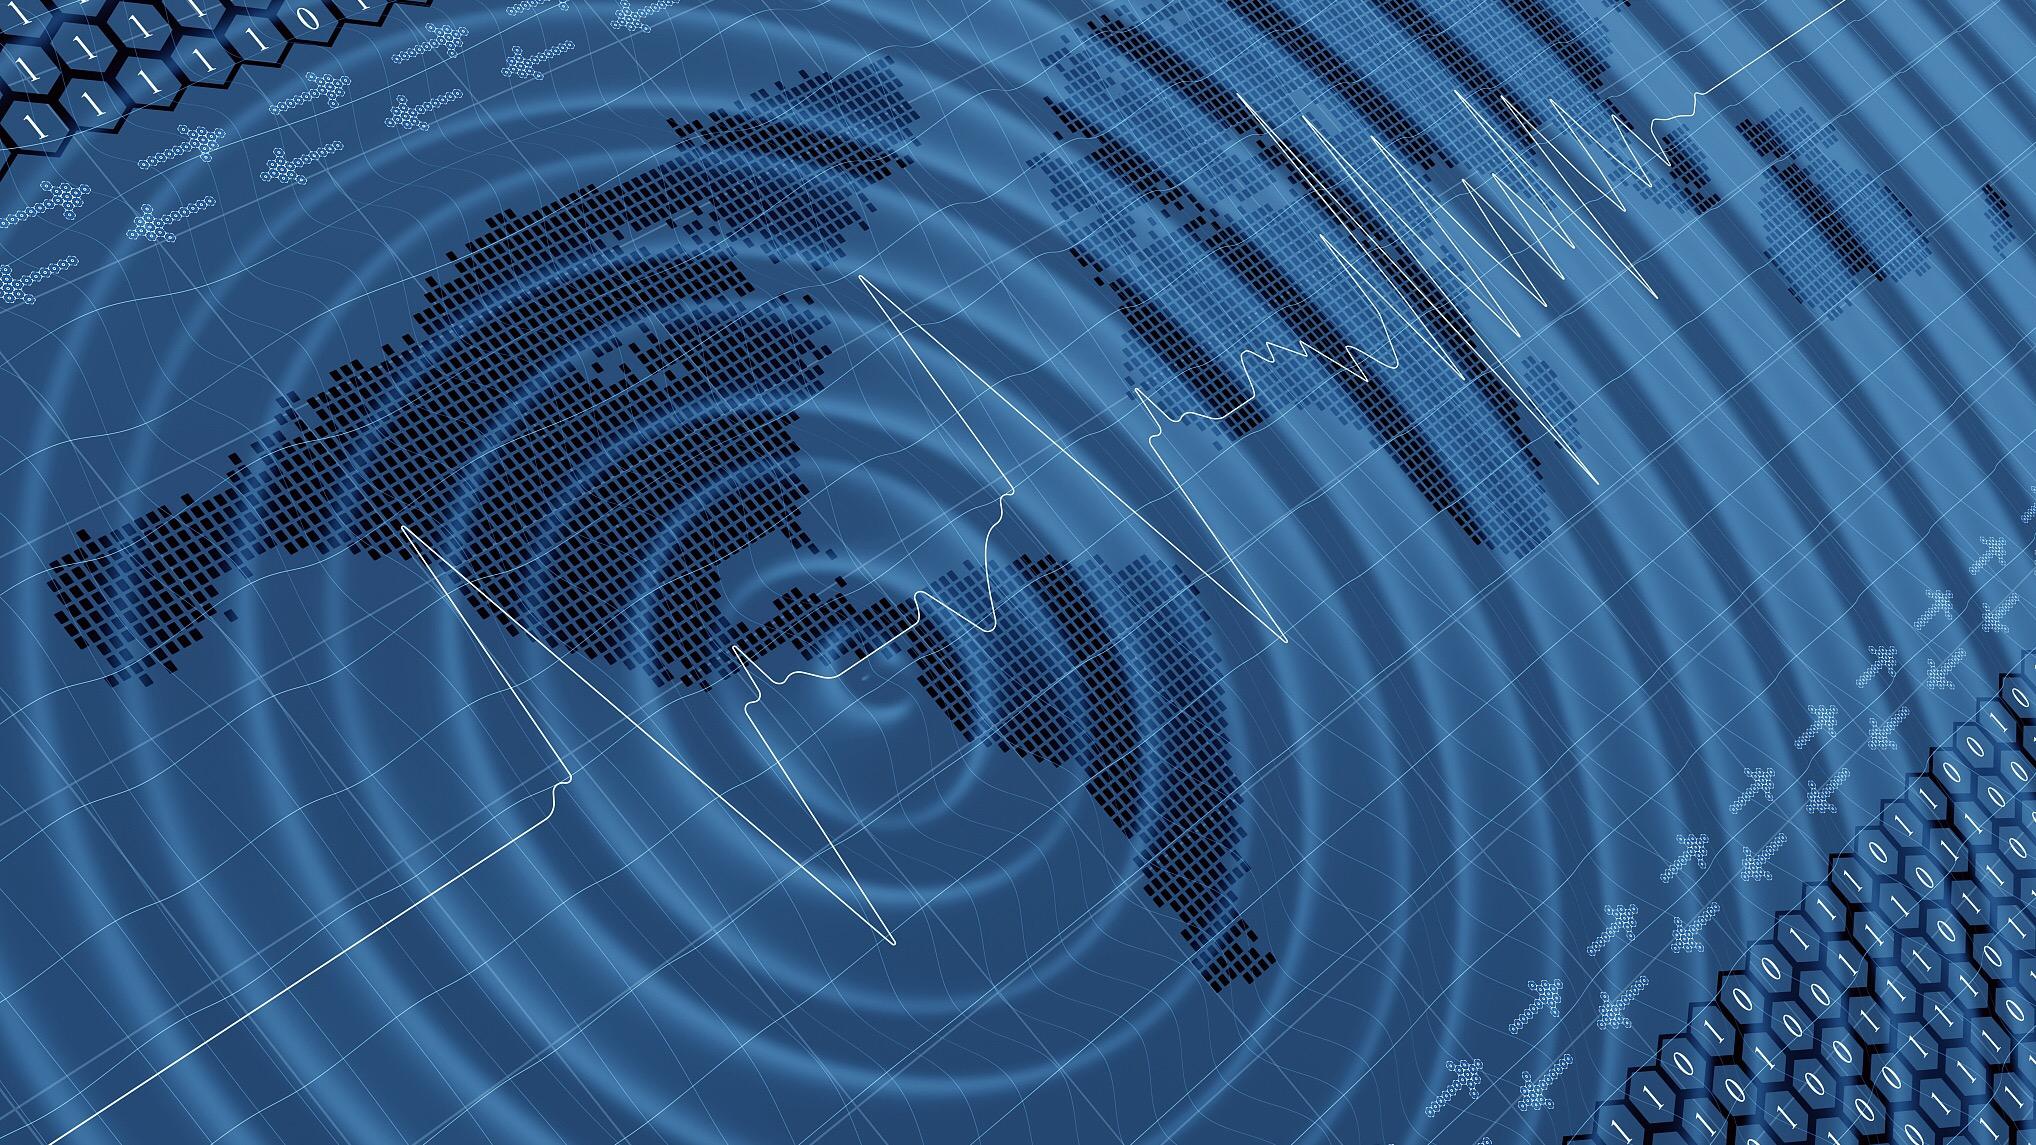 5.2-magnitude quake hits 299 km SSW of Severo-Kuril'sk, Russia -- USGS